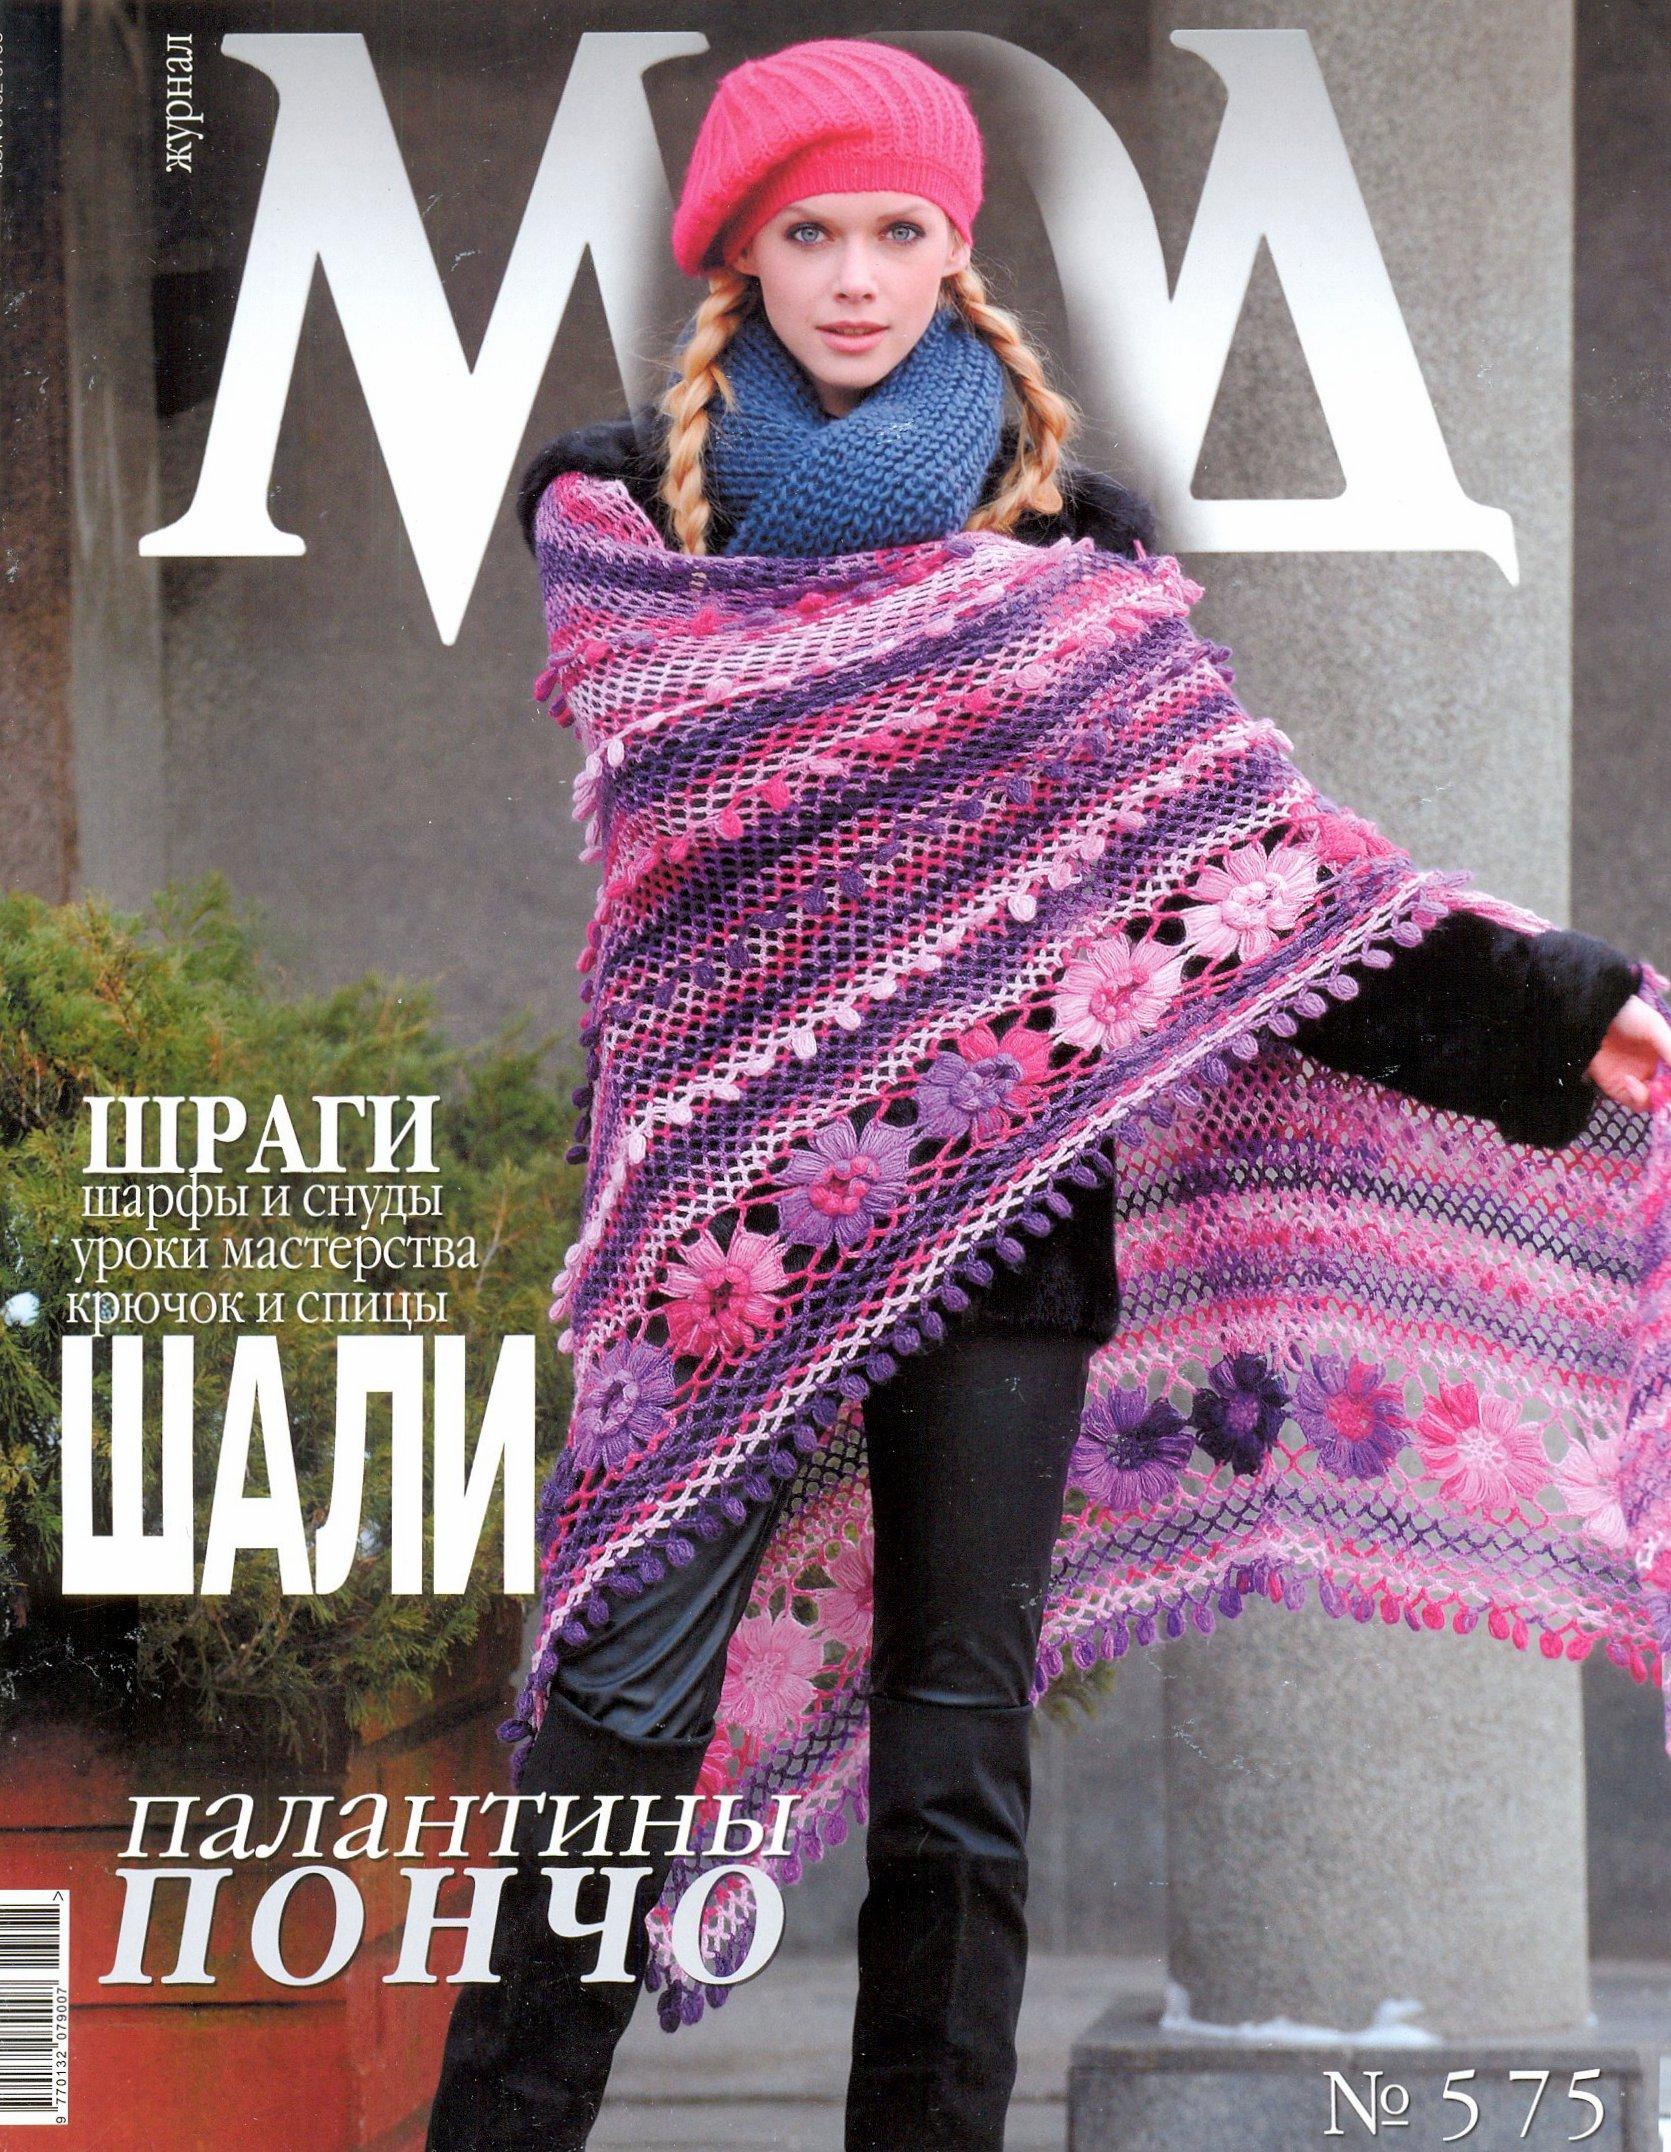 журнал мод 575 шраги шали шарфы снуды шали спицами и крючком